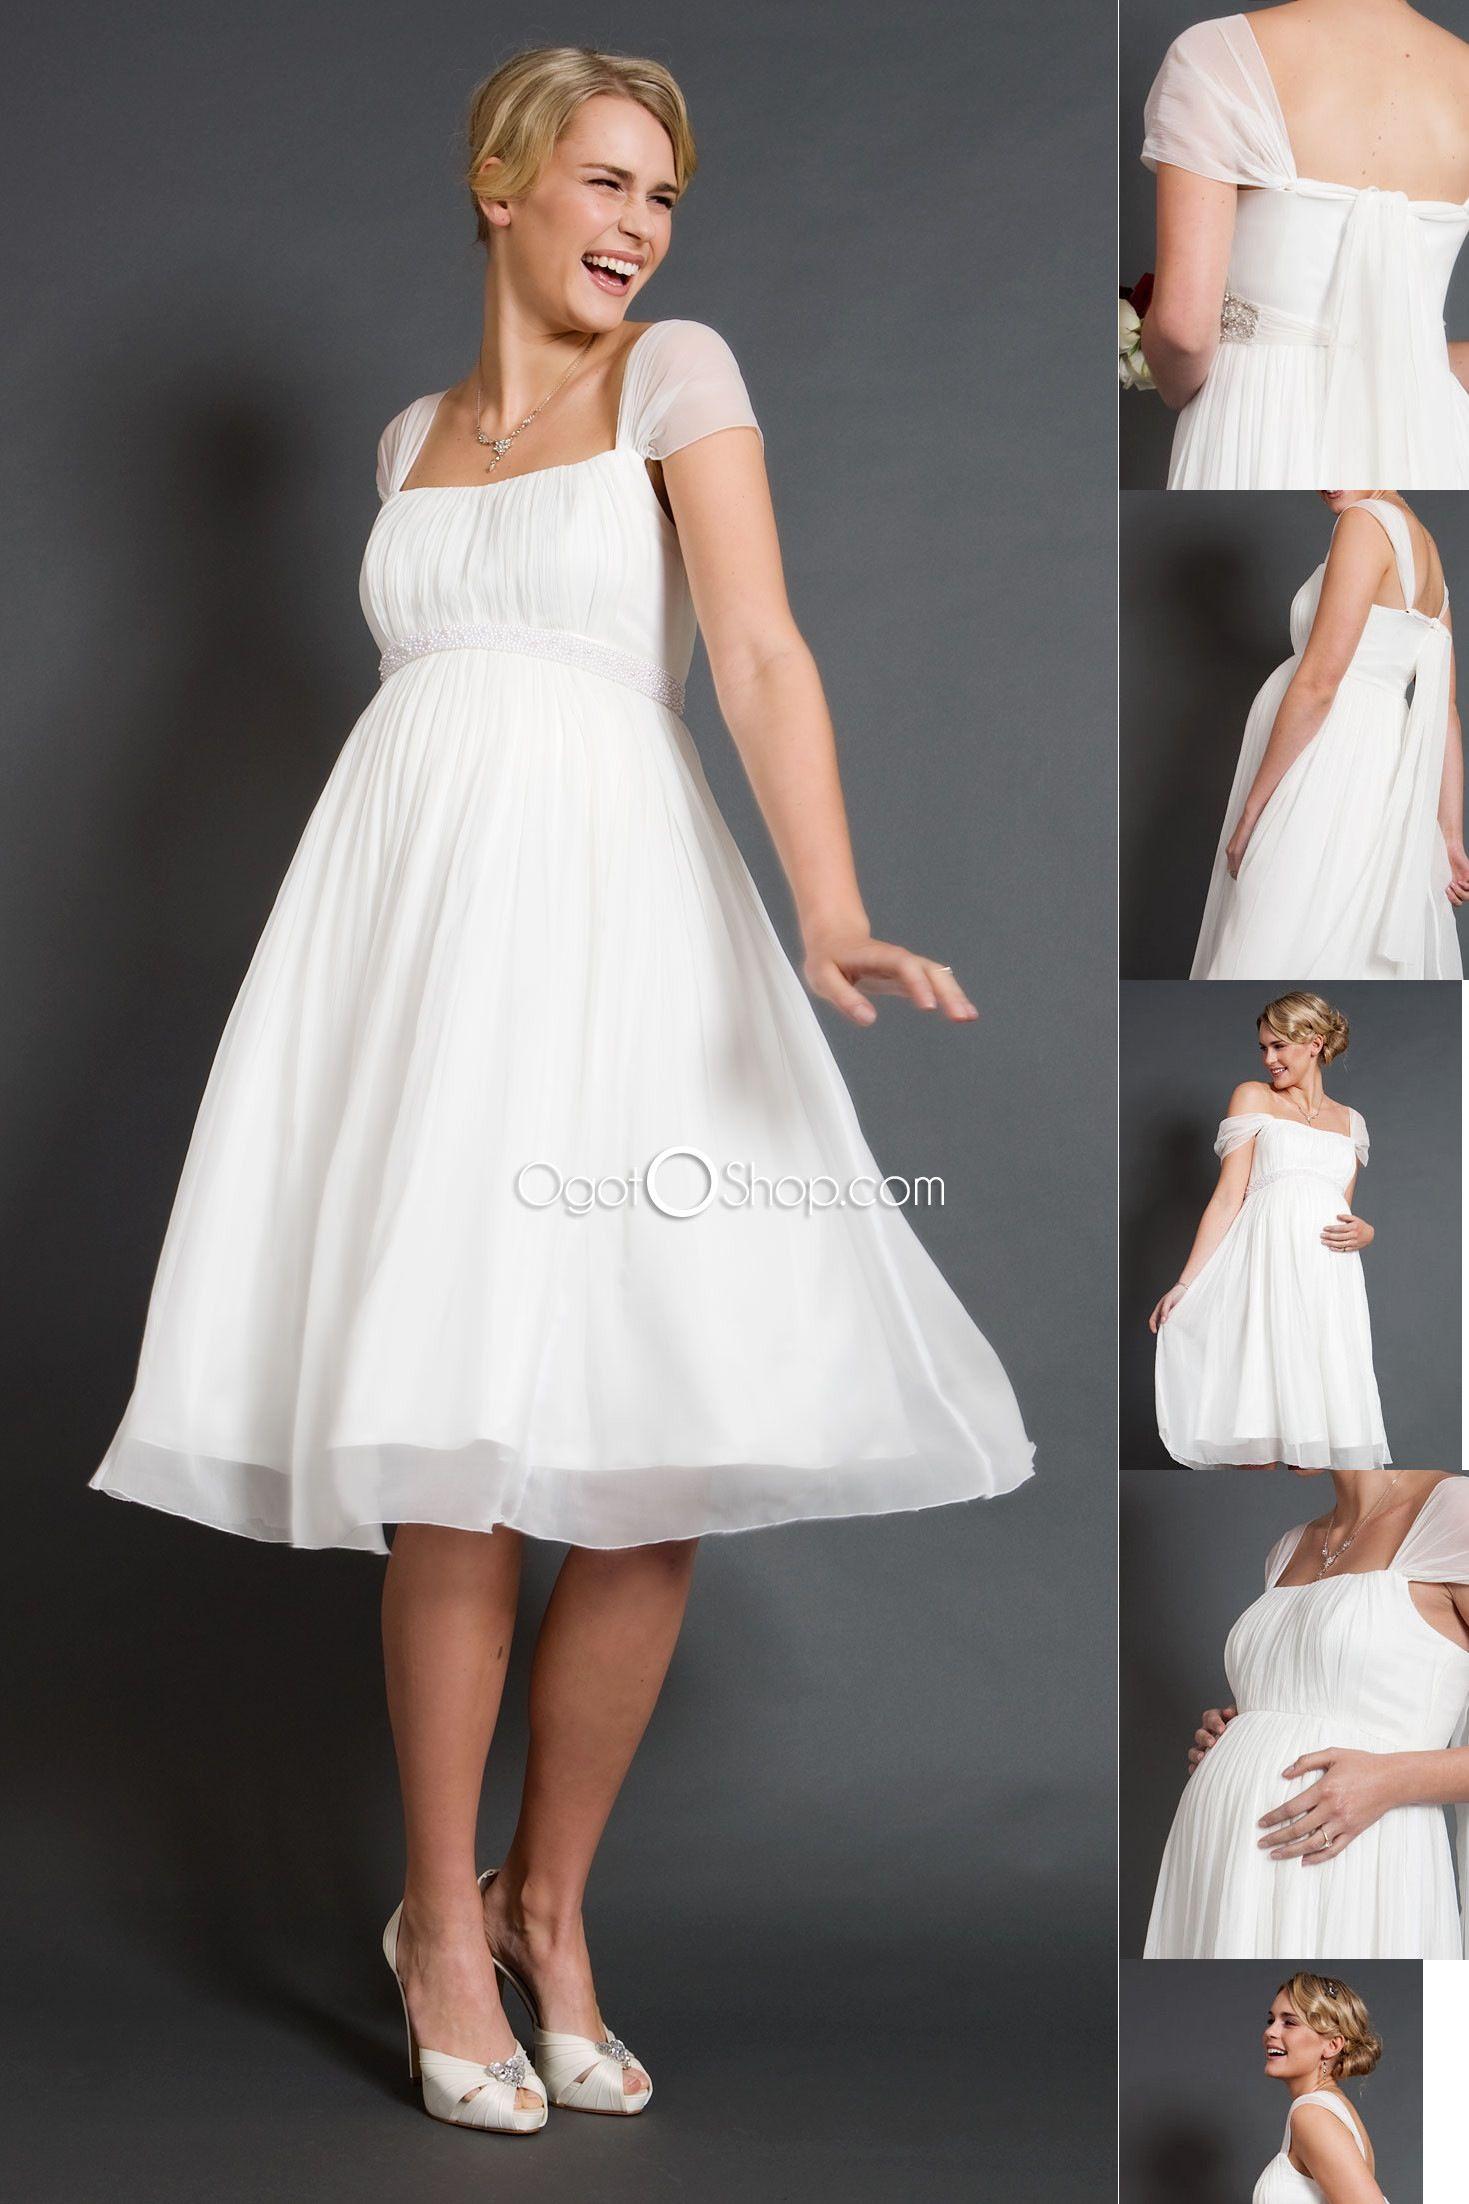 Vera wang plus size wedding dresses  Plus size cap sleeves  Wedding dresses  Pinterest  Wedding dress